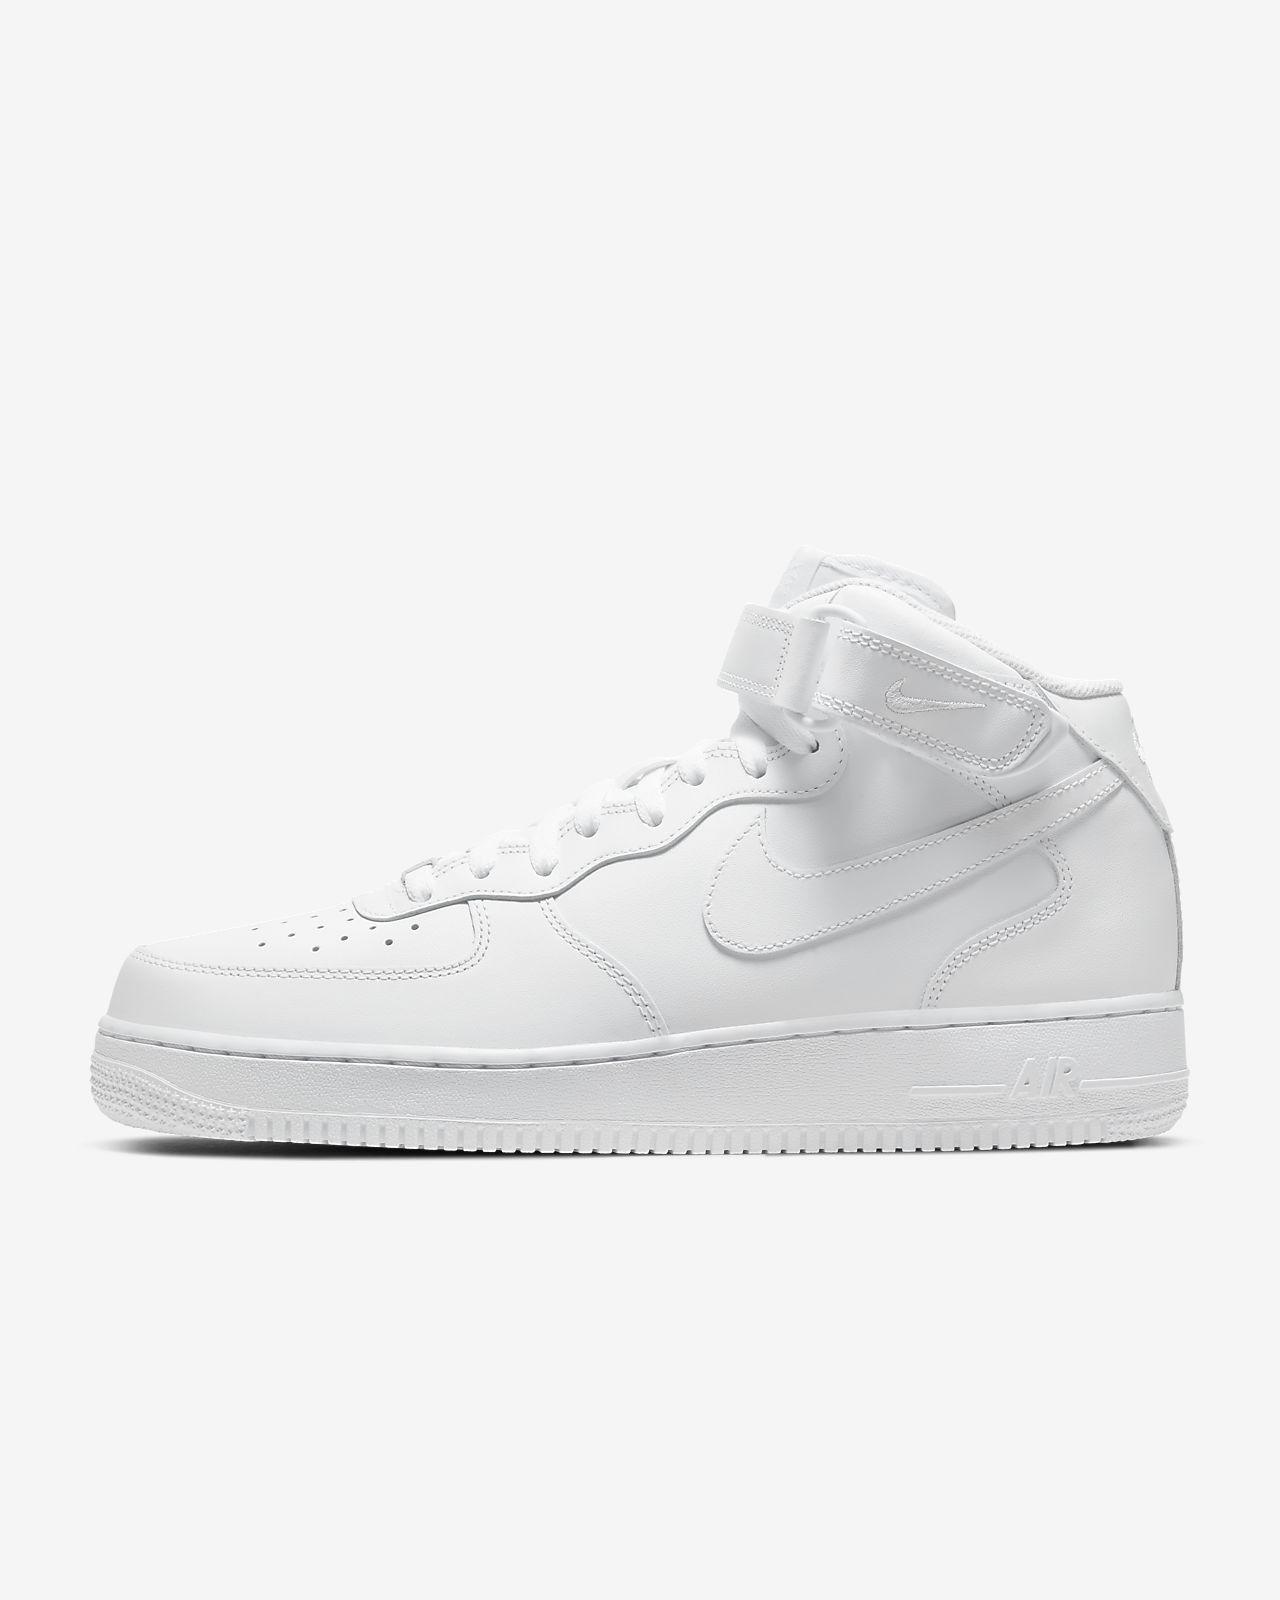 Nike Air Force 1 Mid '07 Herrenschuh